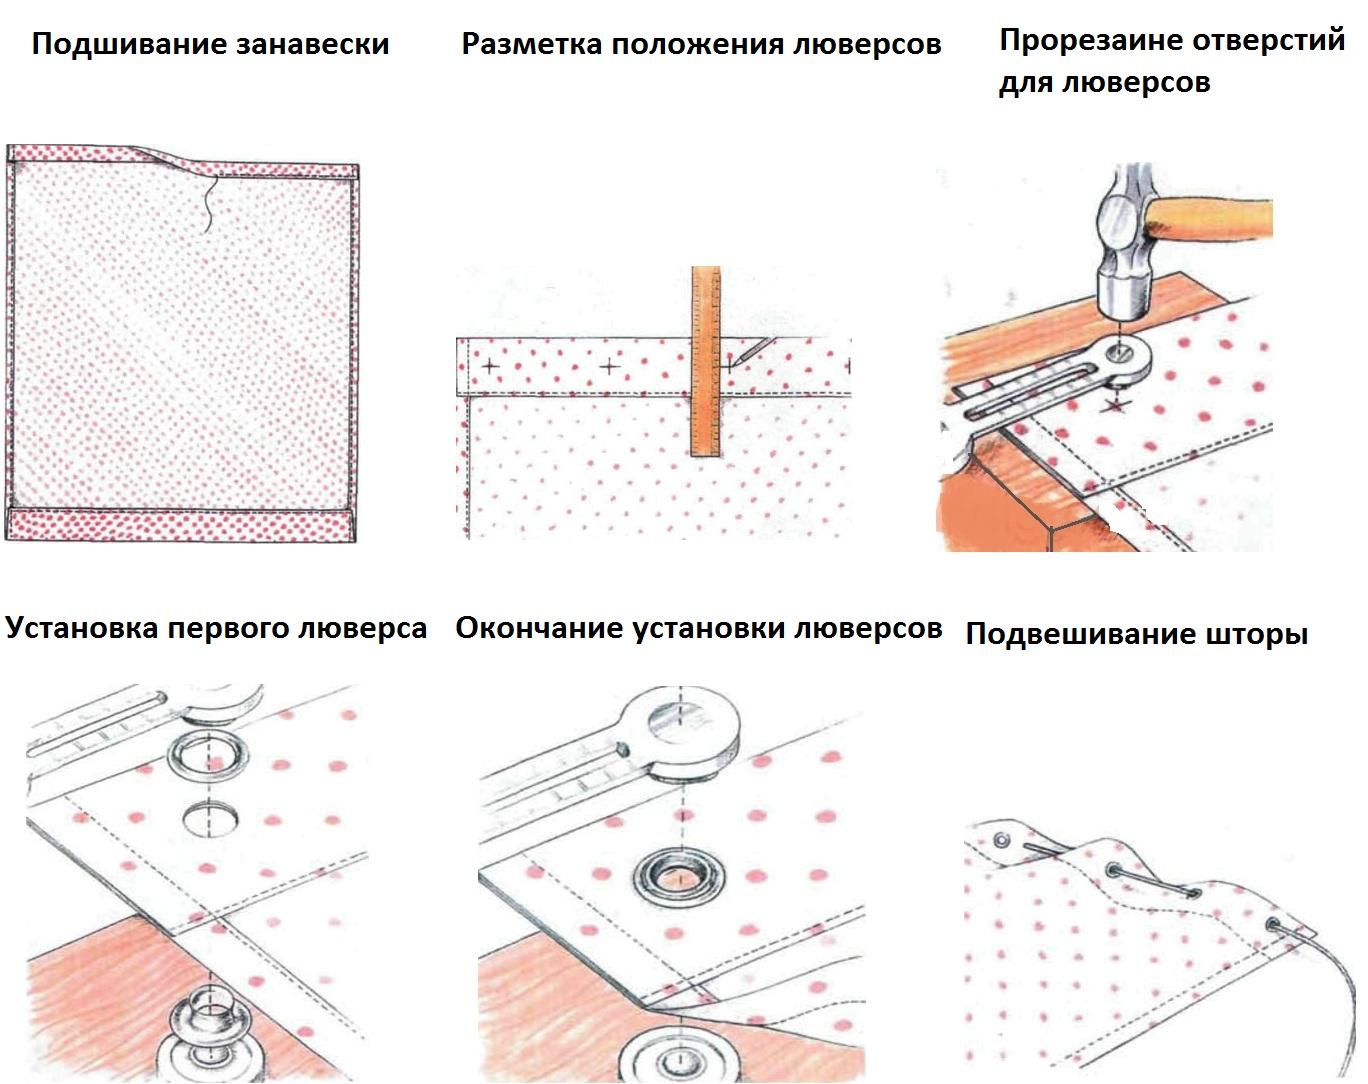 processus d'installation des œillets